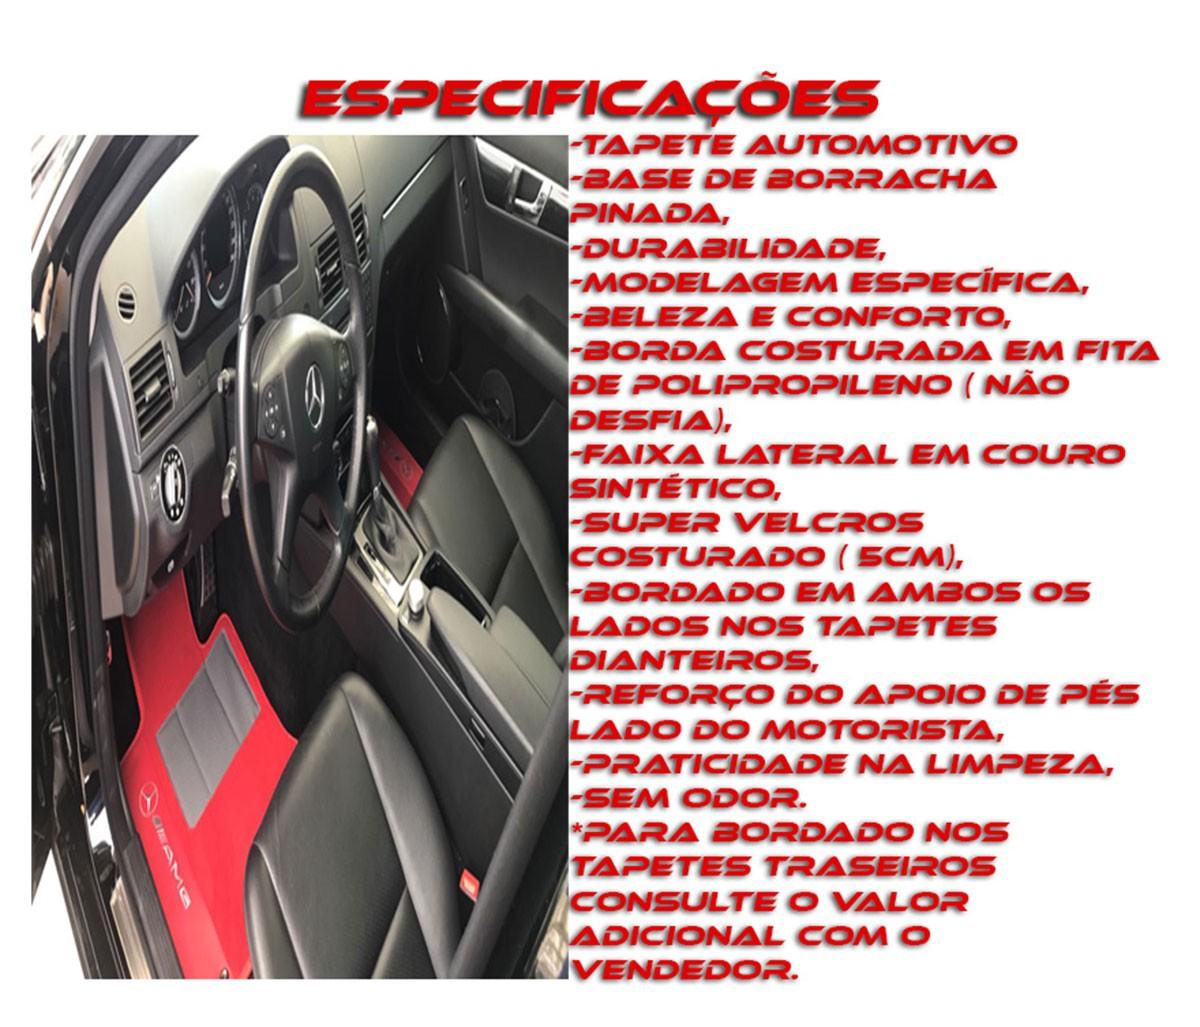 Tapete Hyundai Veloster Borracha Pinada  Hitto O Melhor!